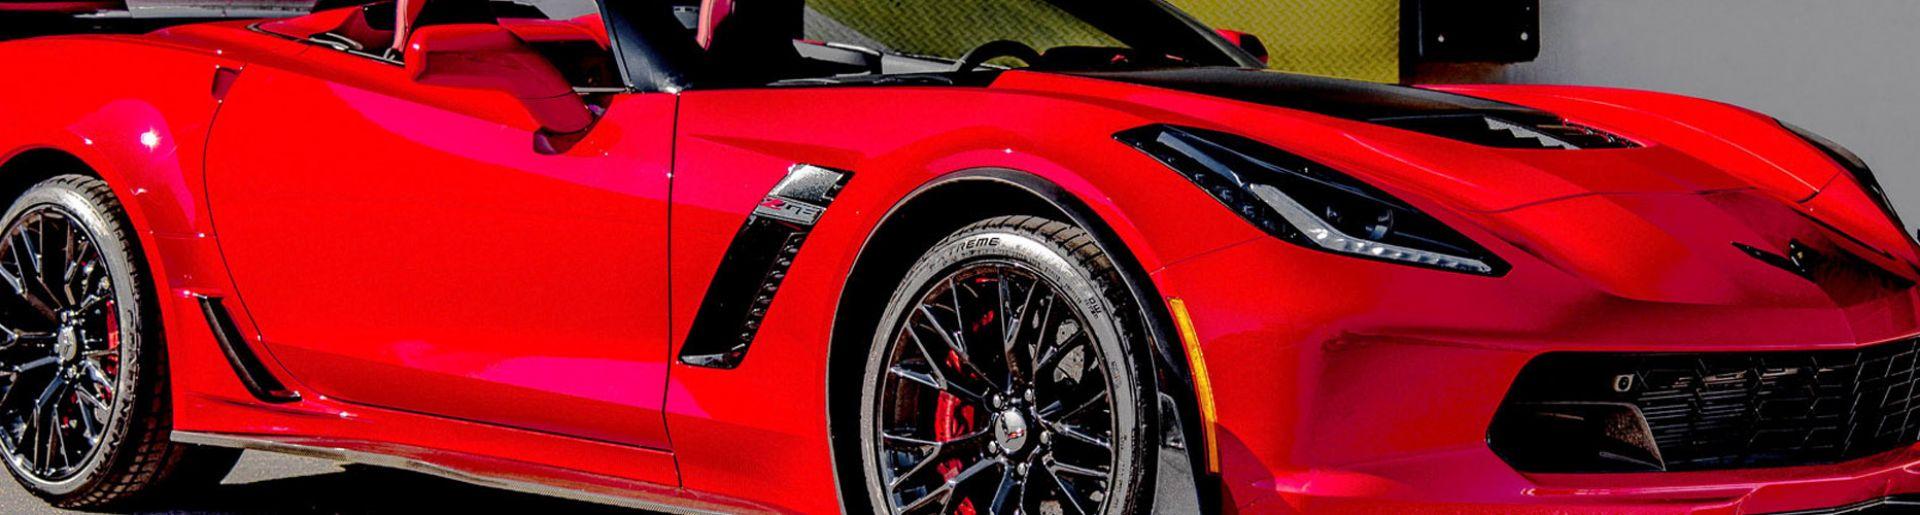 Las Vegas Exotic Car Rental Audi R8 V10 Convertible Bmw